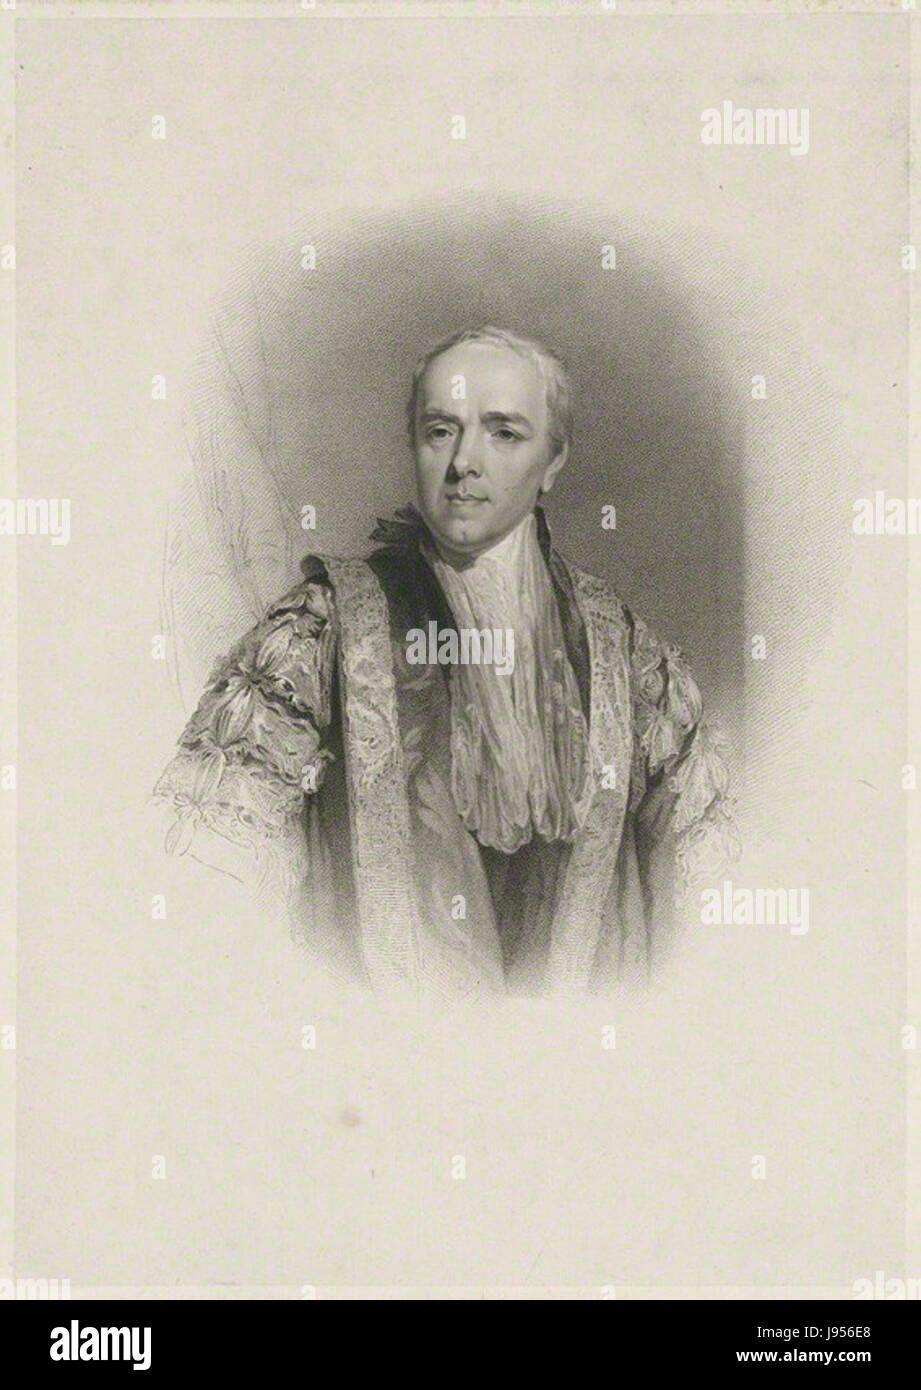 William Wyndham Grenville, 1st Baron Grenville by John Samuel Agar, after John Wright, after William Owen - Stock Image